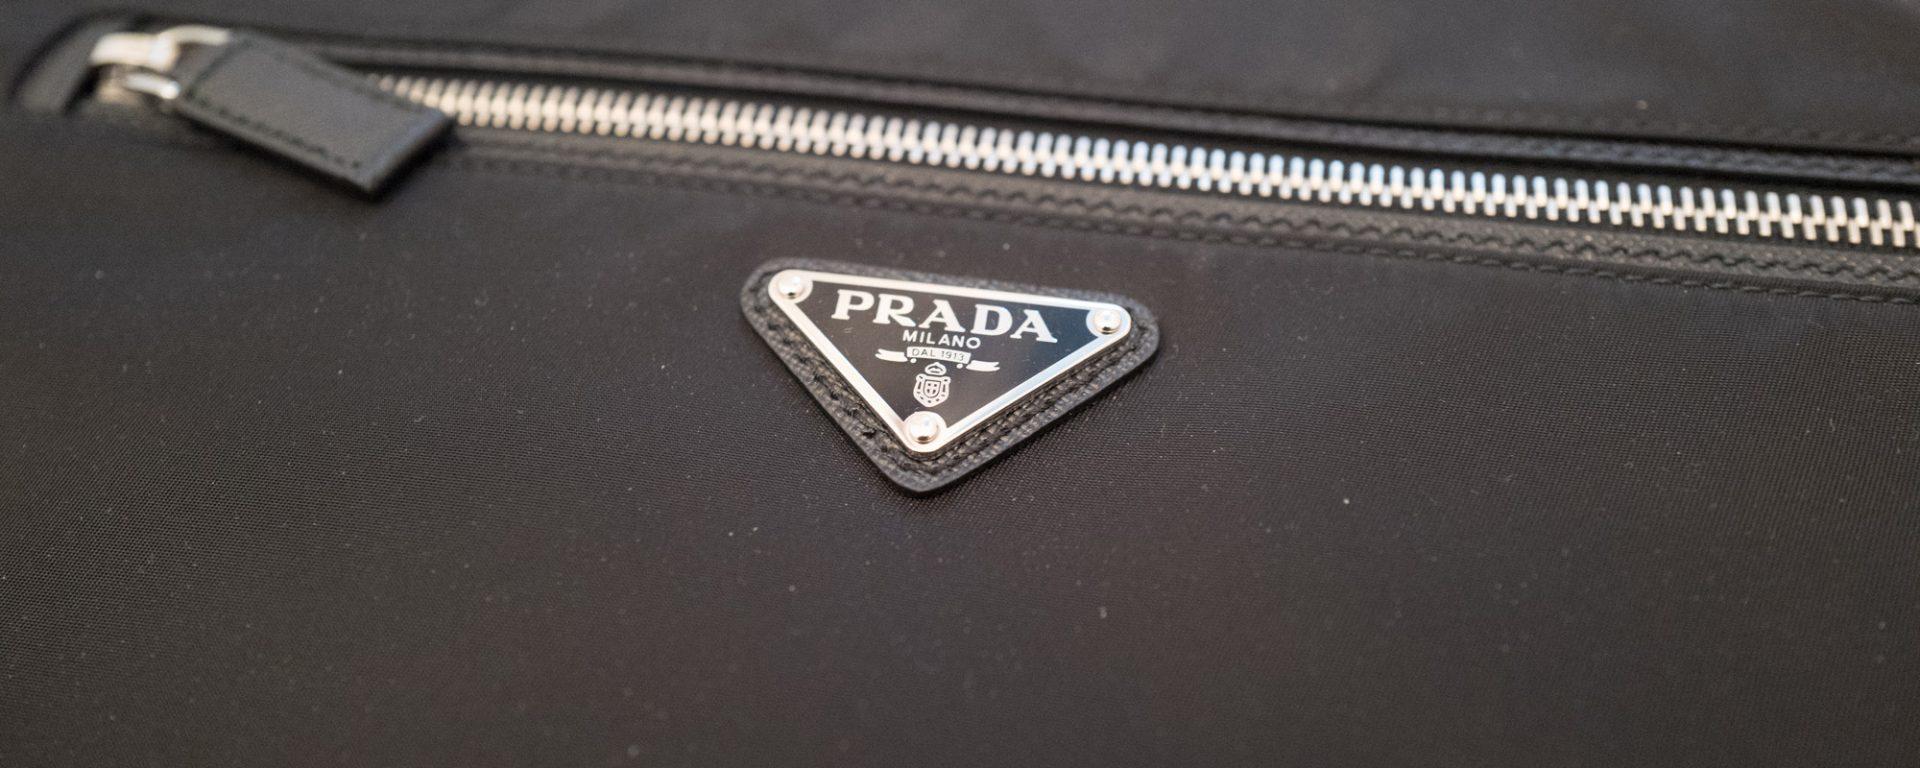 buy online c3855 287f7 Prada laptop case – Retro Gym Geek